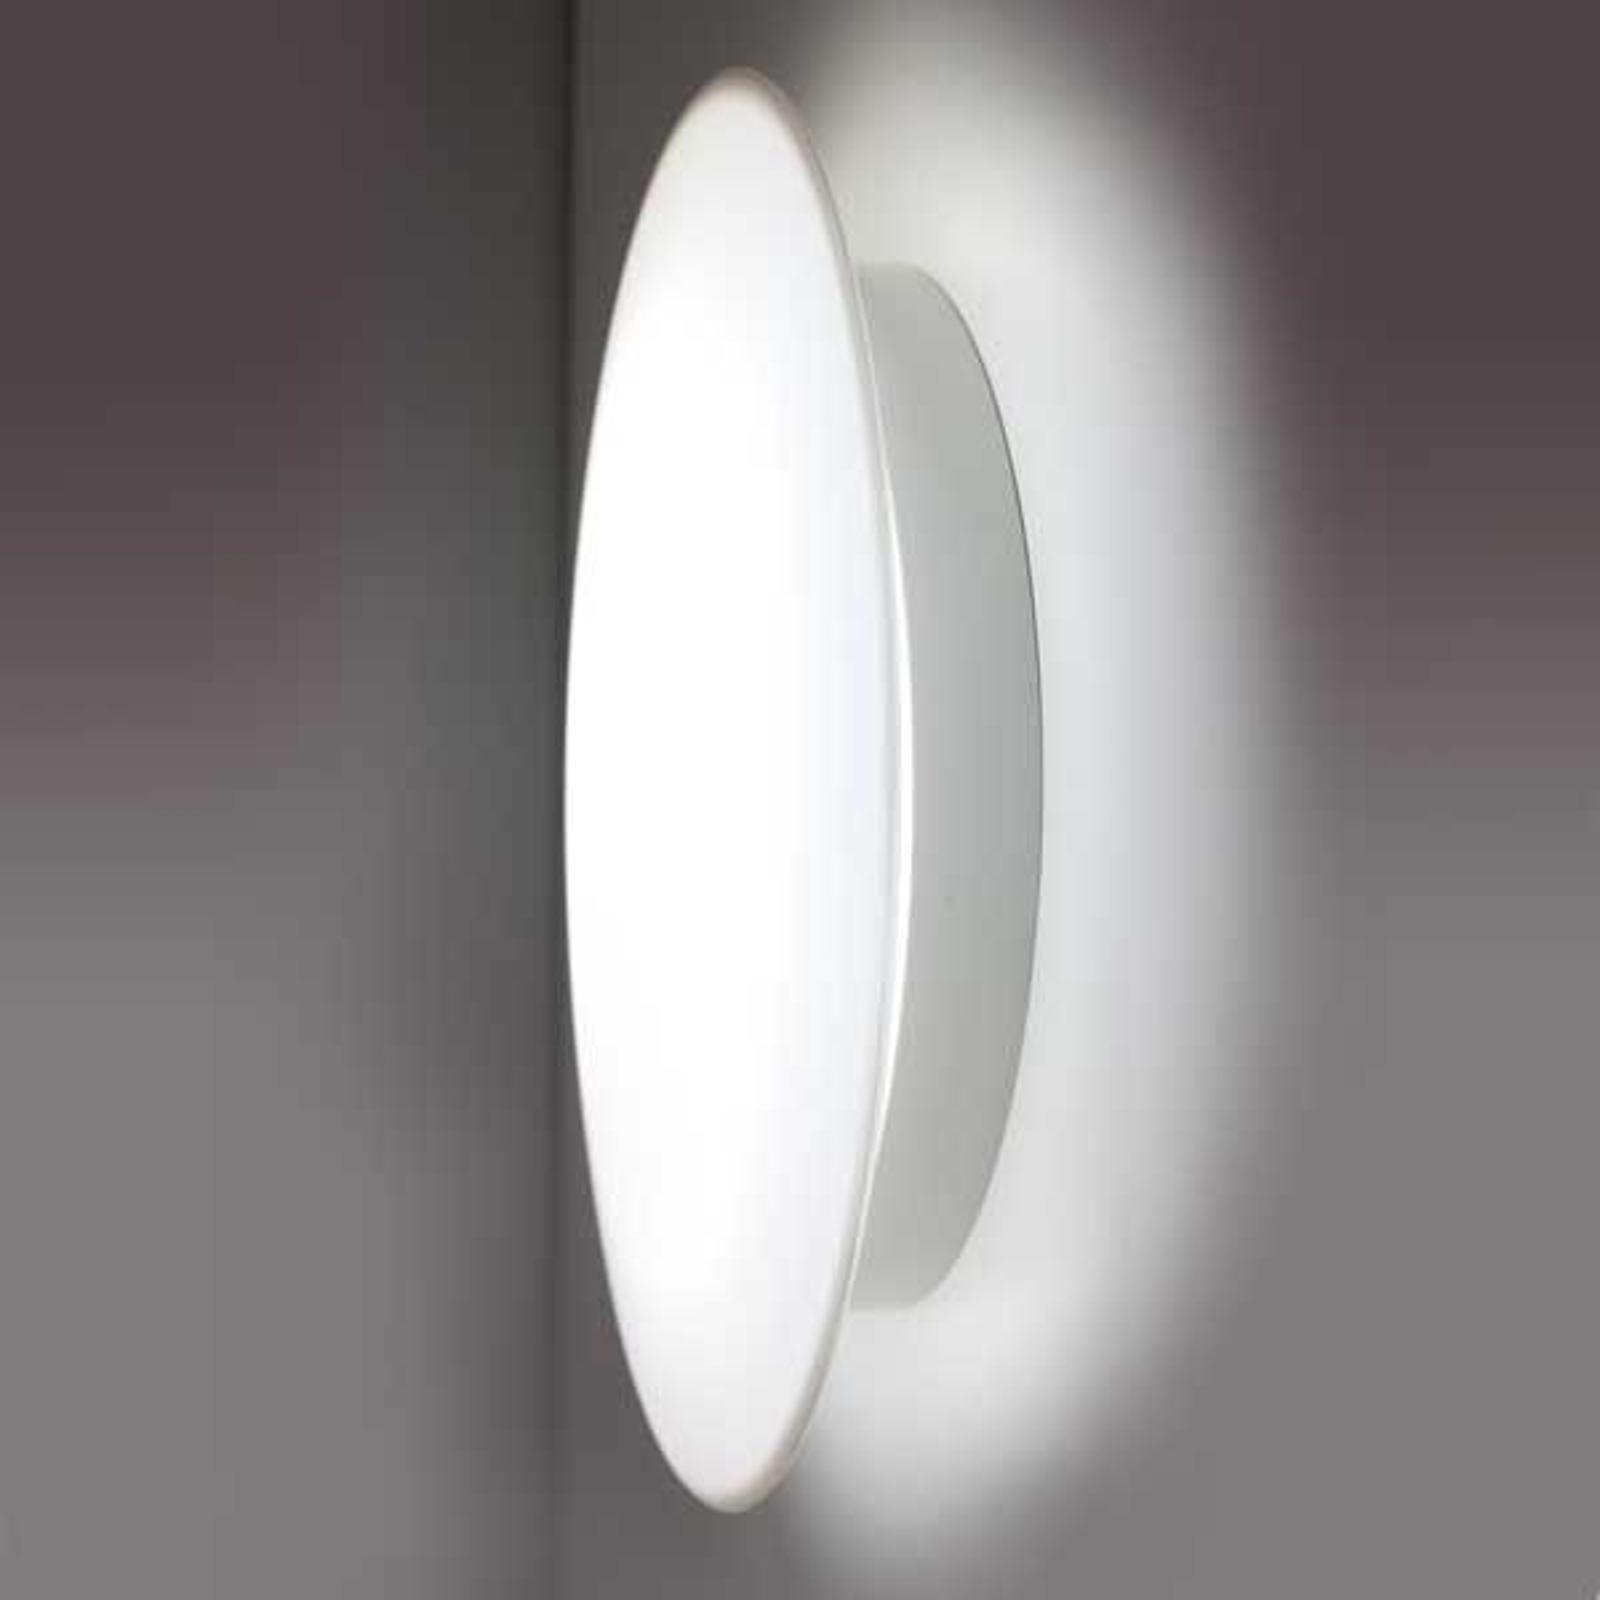 SUN 3 LED-lamp van de toekomst wit 13 W 4 K